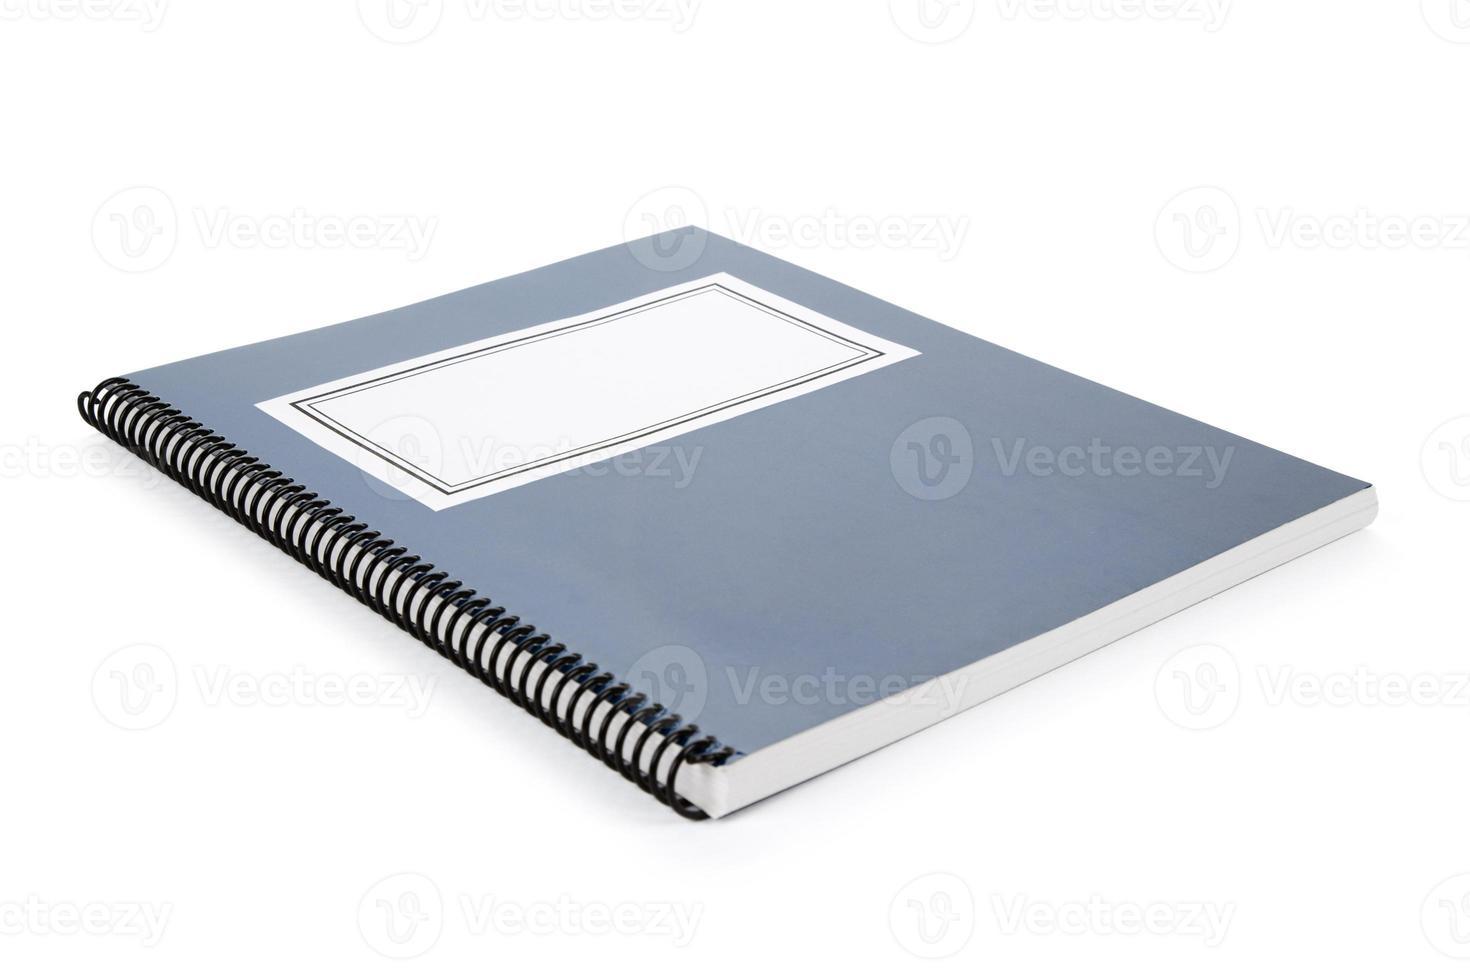 manuale scolastico blu foto